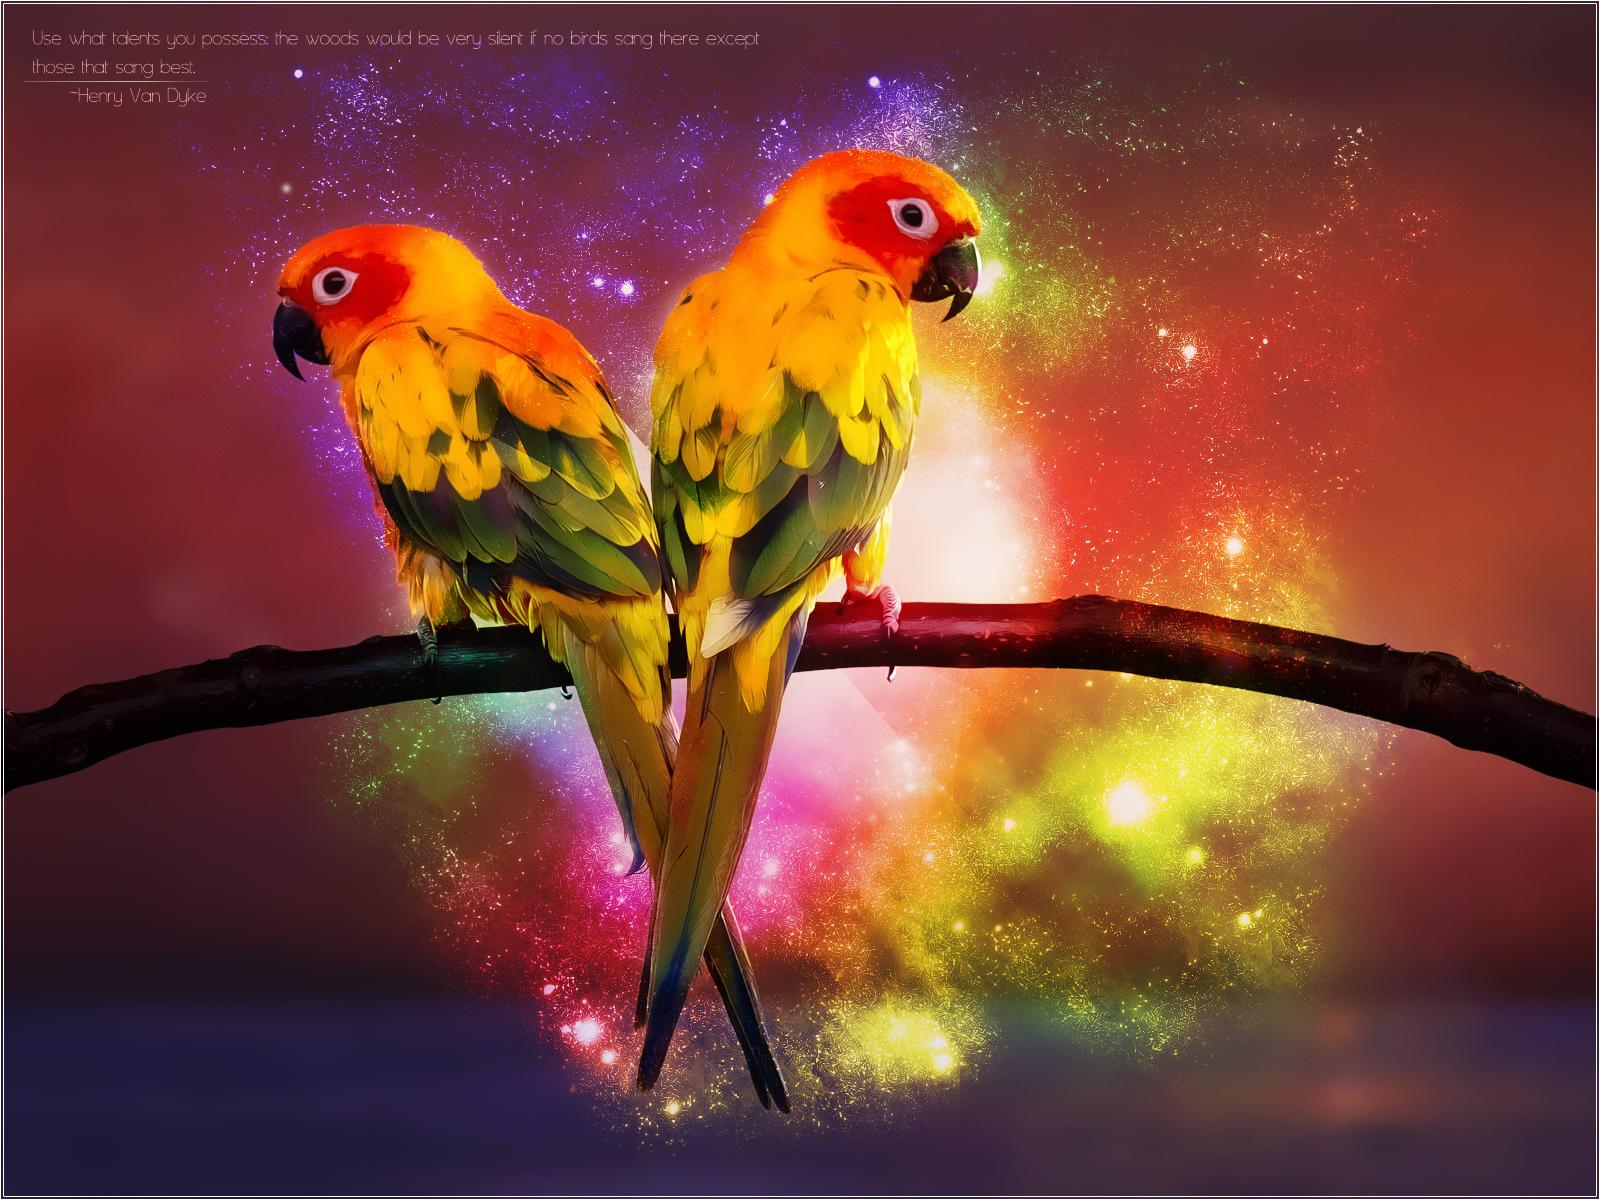 paradise_birds_by_pimart-d3j6rnn.jpg